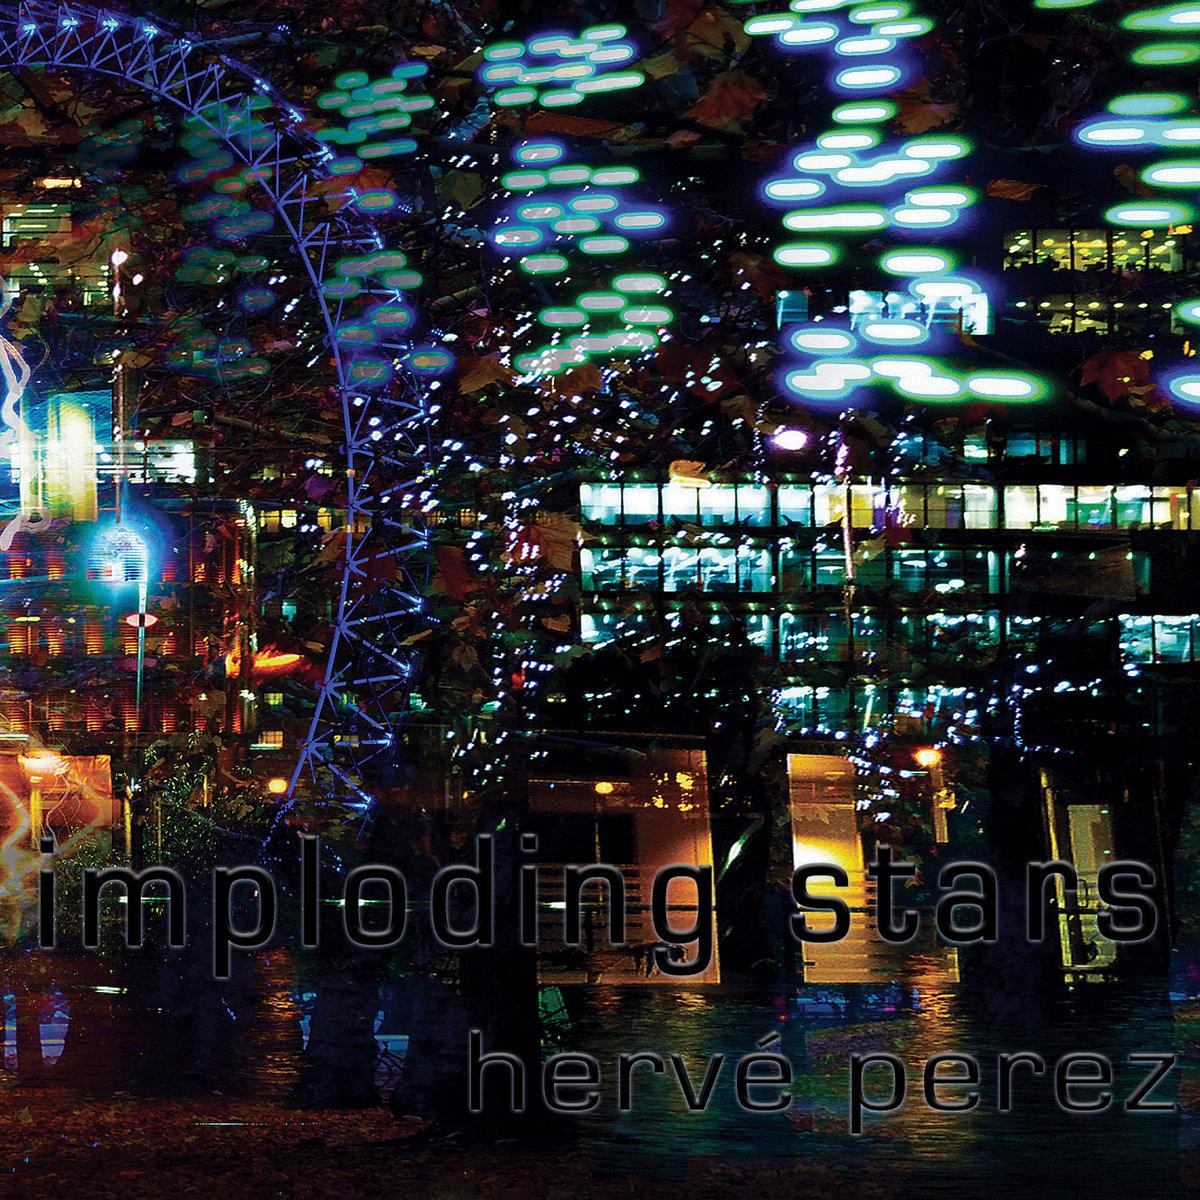 Album Imploding Stars by Herve Perez